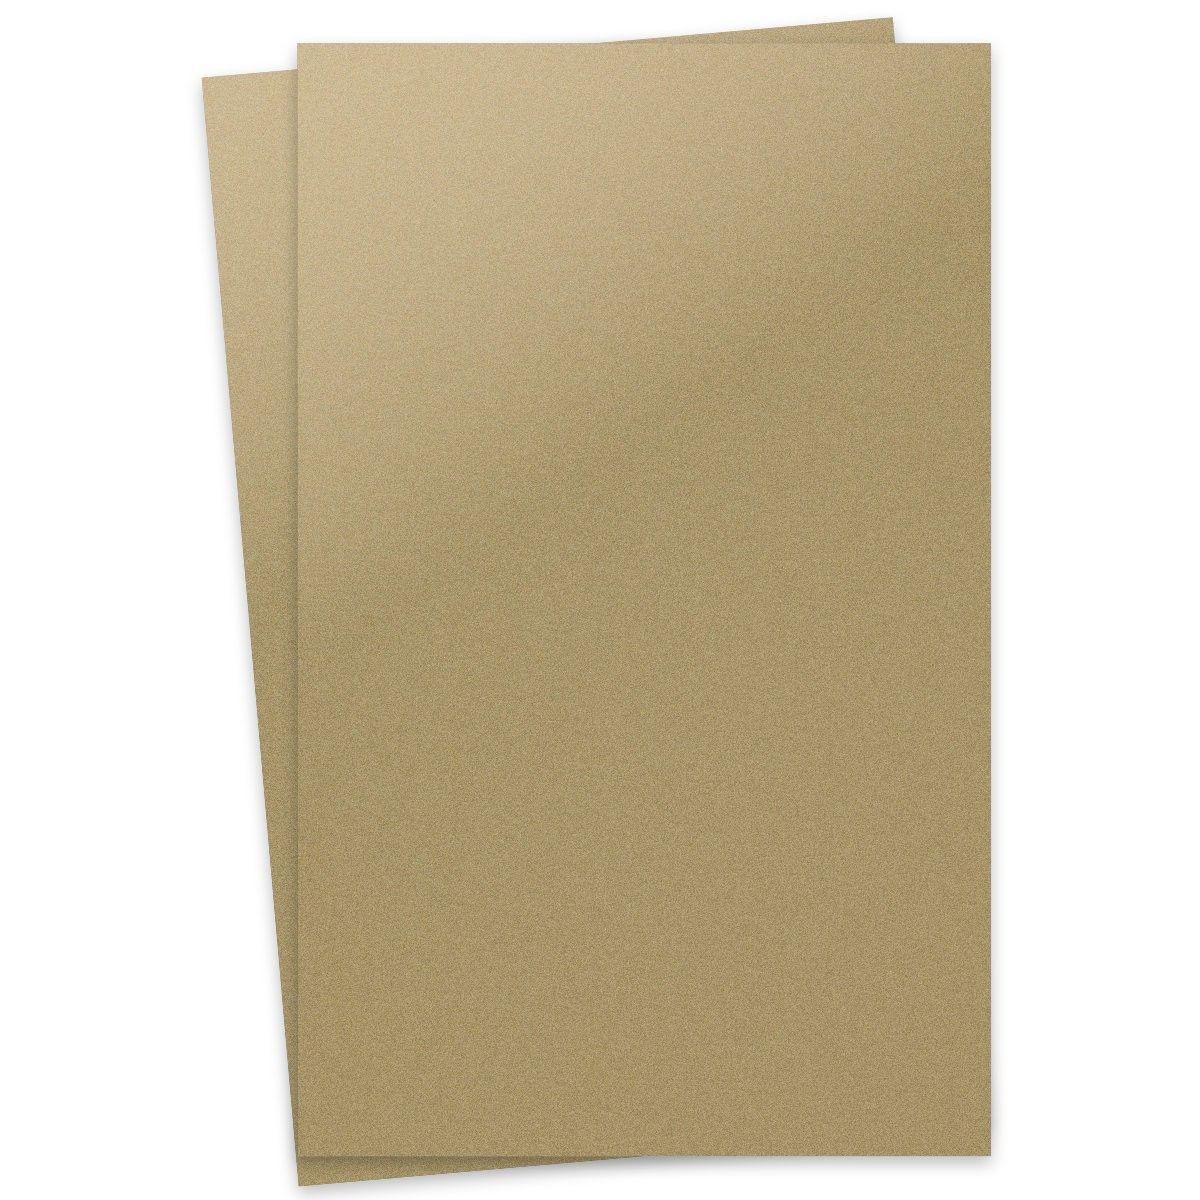 Curious Metallic Gold Leaf 11 X 17 Ledger Size Cardstock Paper 300 Gsm 111lb Cover 100 Pk In 2021 Metallic Gold Leaf Gold Leaf Gold Metal